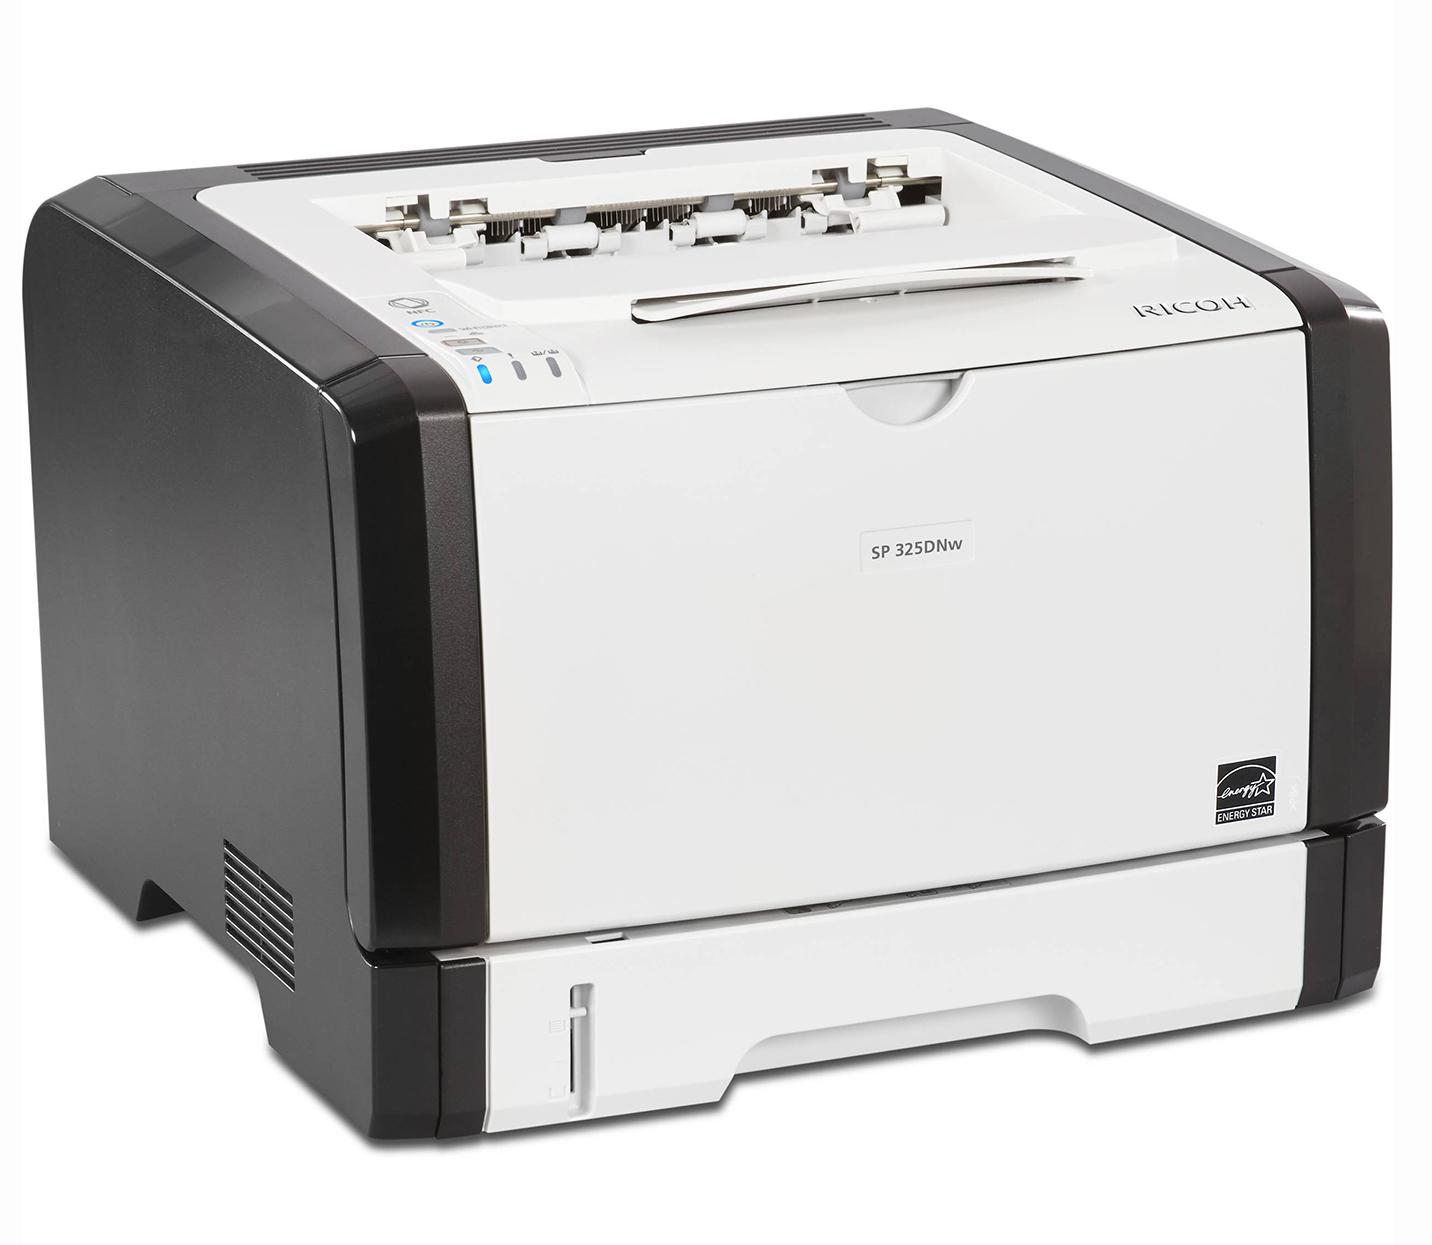 drukarka Ricoh SP 325DNw